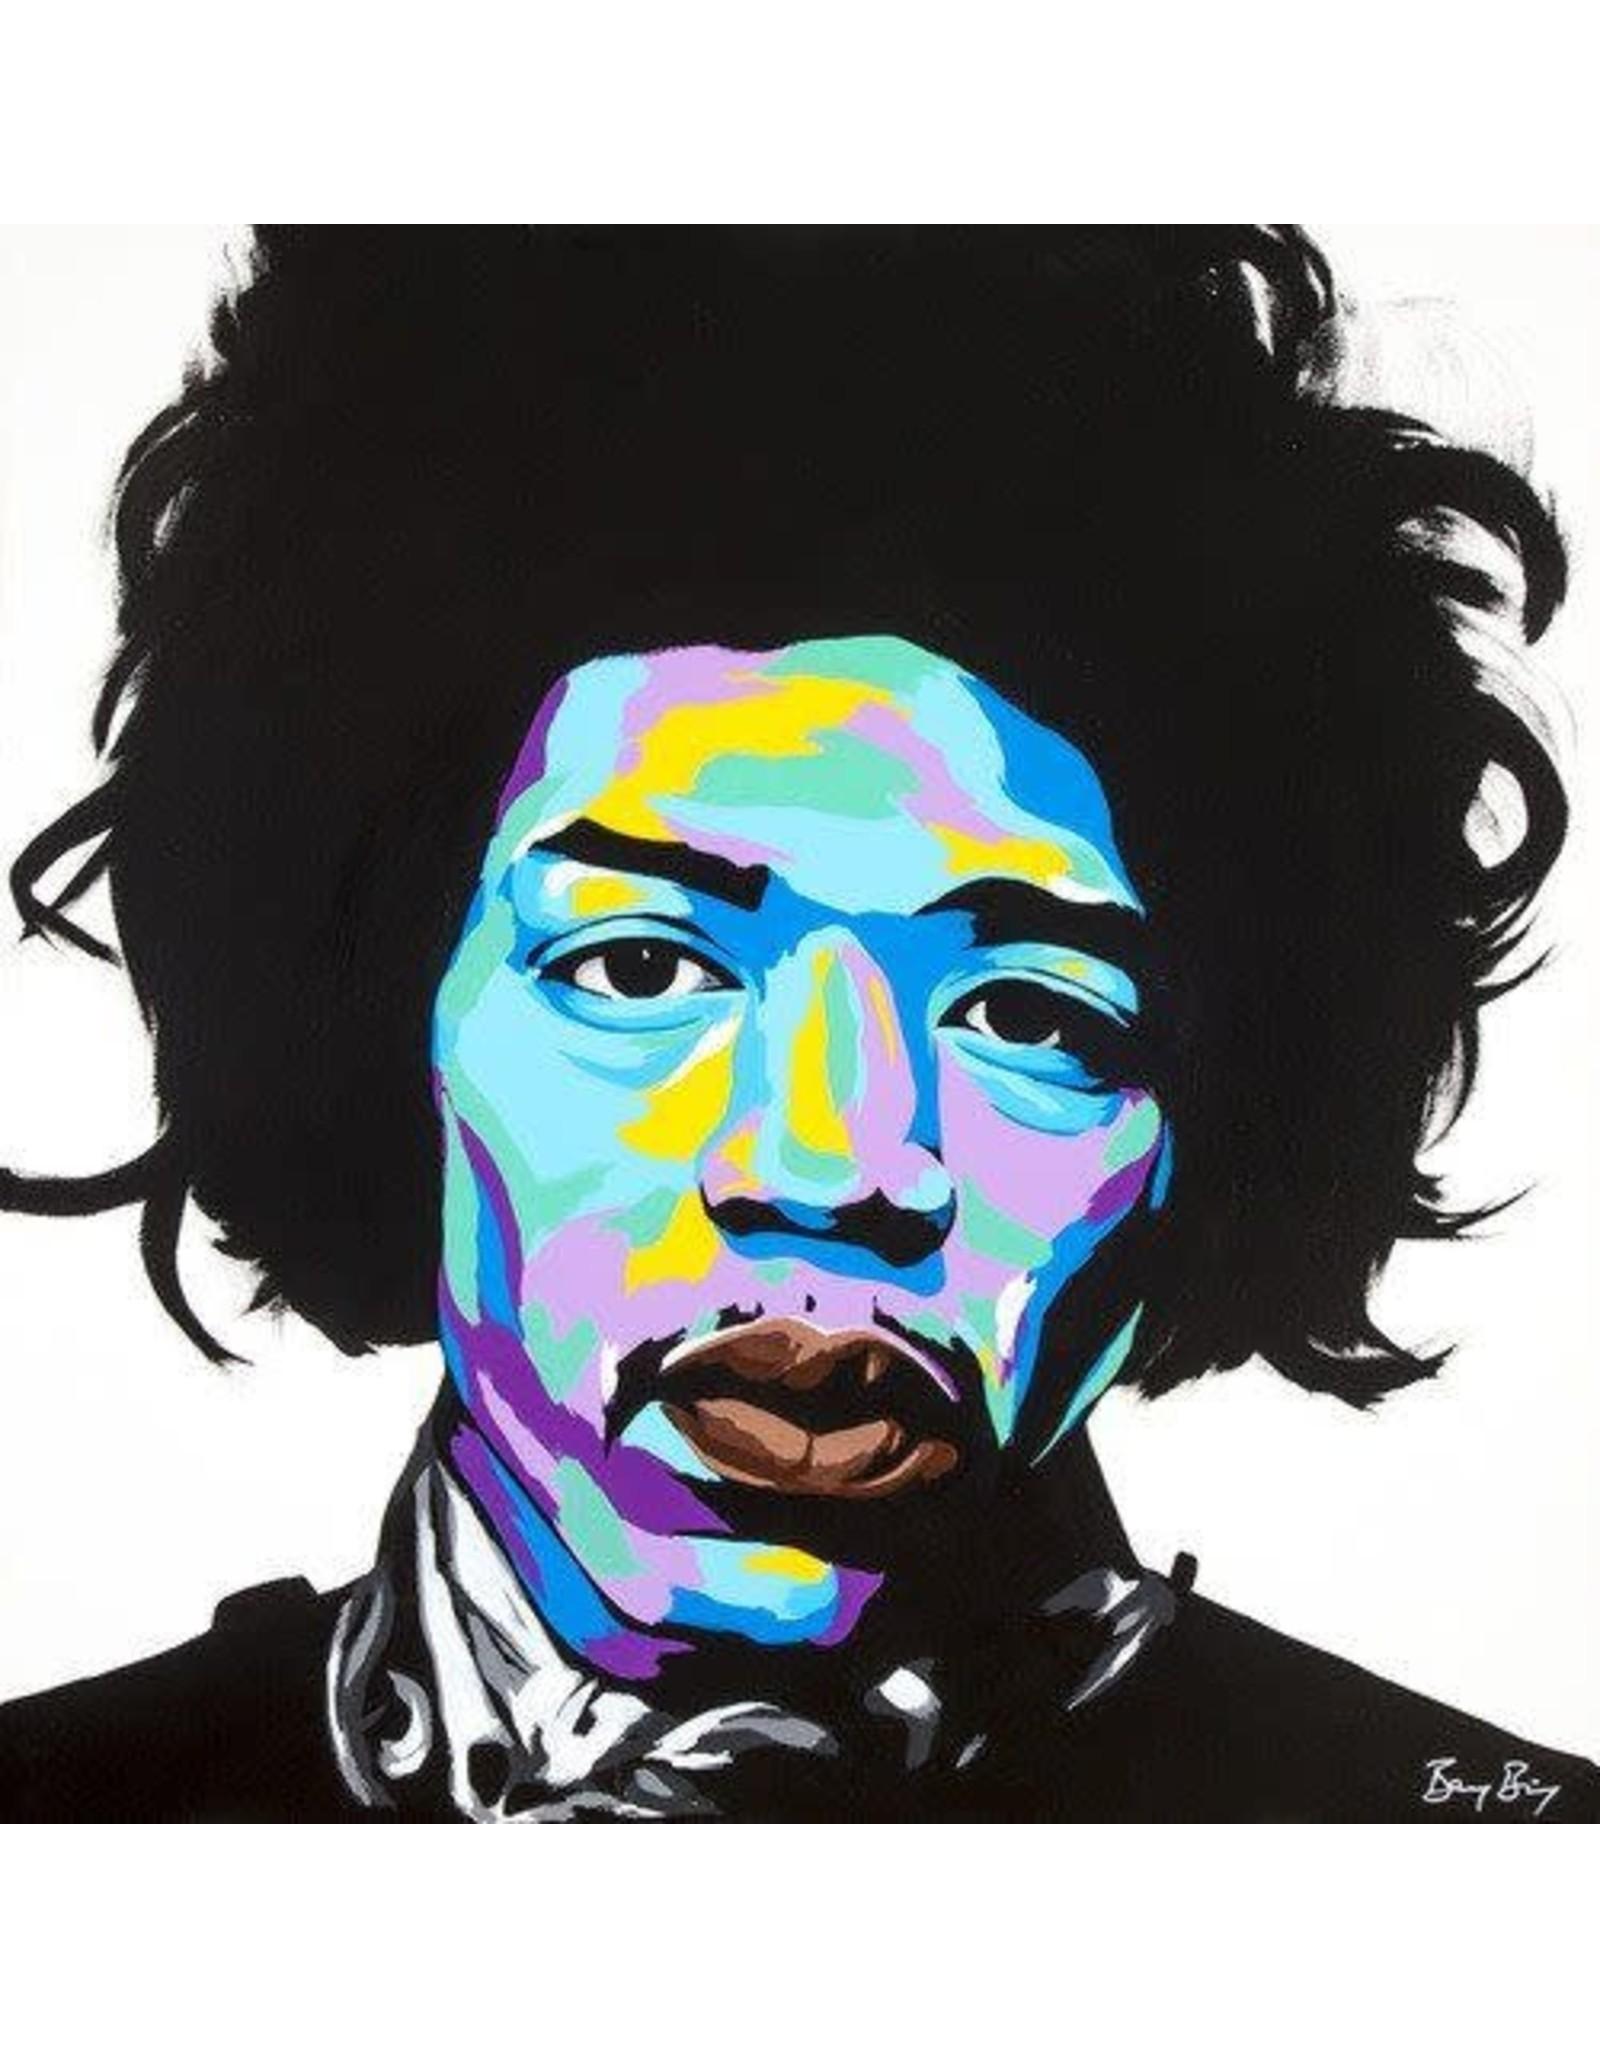 Benny Bing Benny Bing - Jimi Hendrix 30x30 Framed